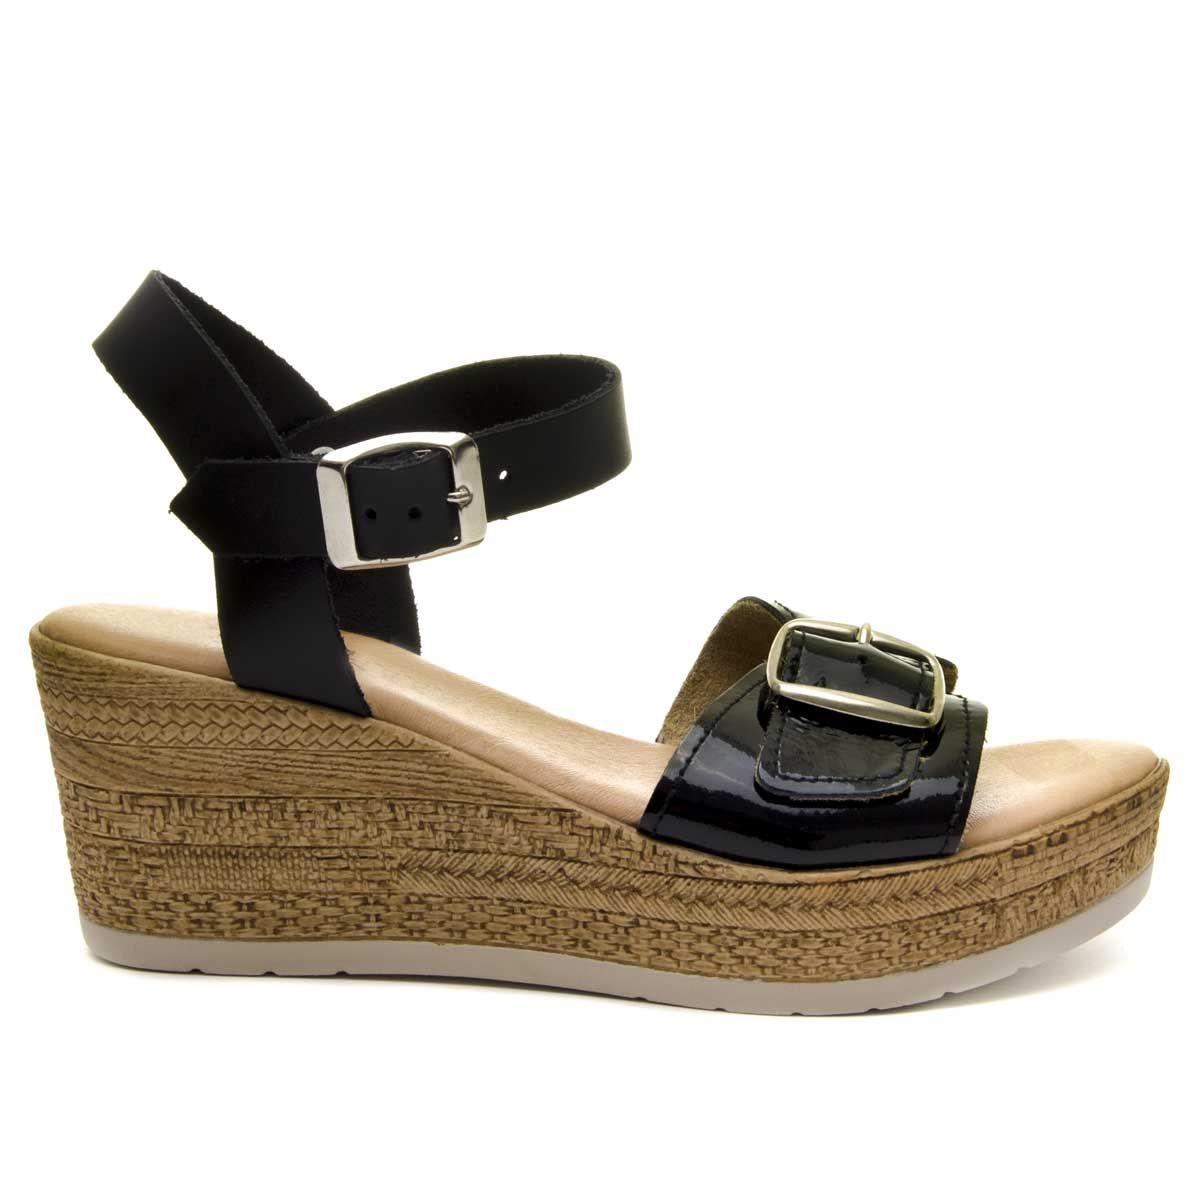 Purapiel Wedge Sandal in Black